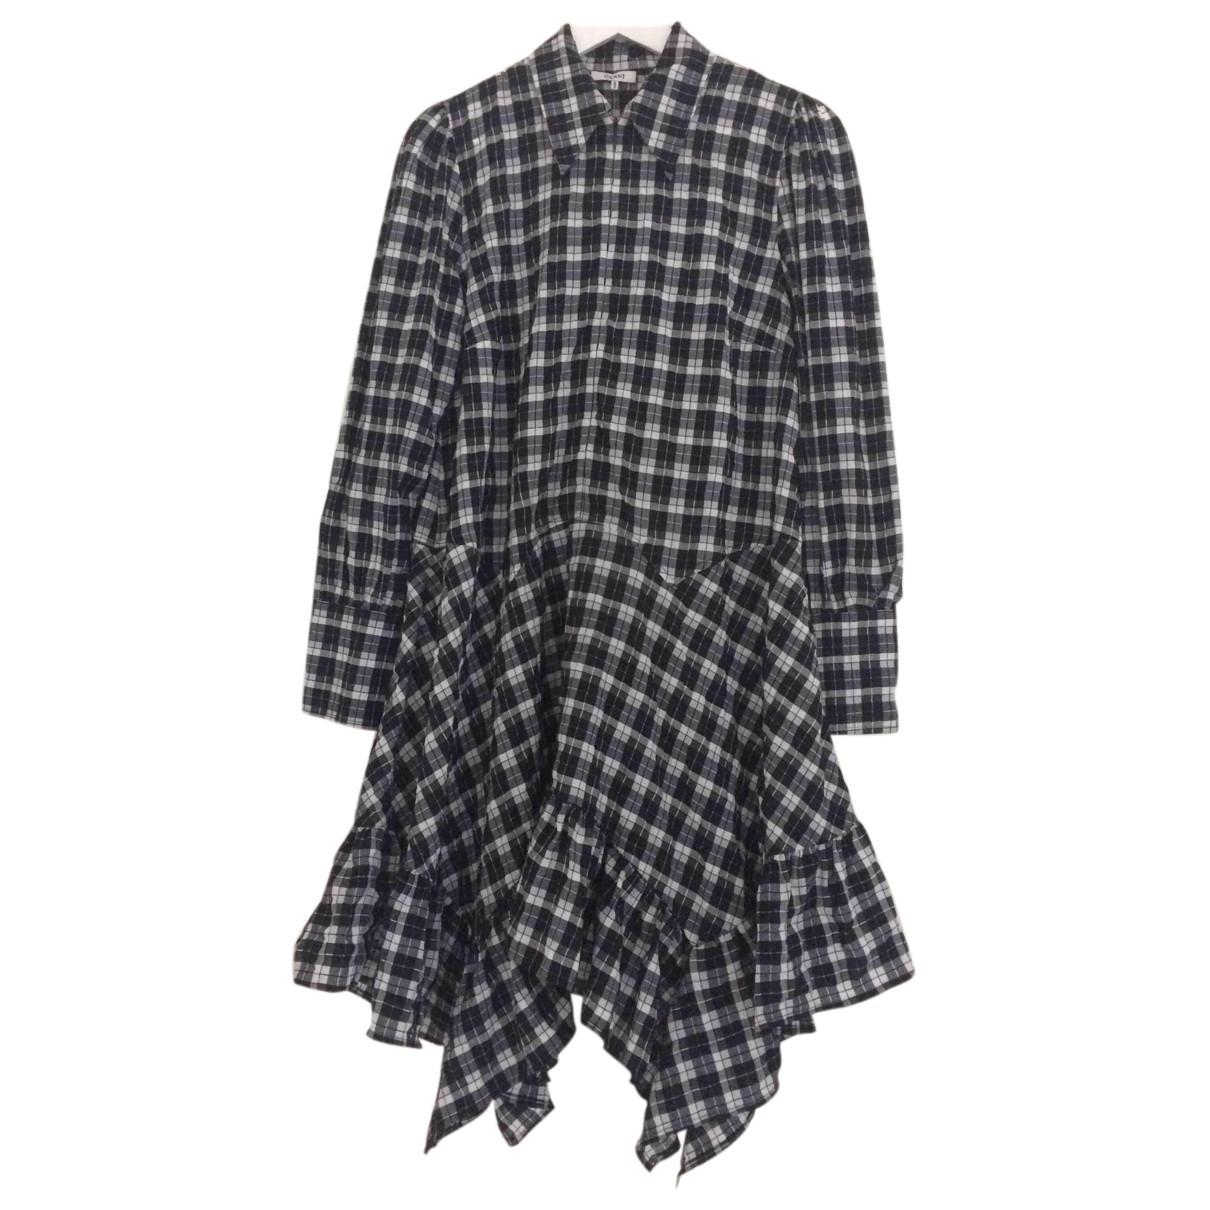 Ganni N Multicolour Cotton dress for Women 36 FR